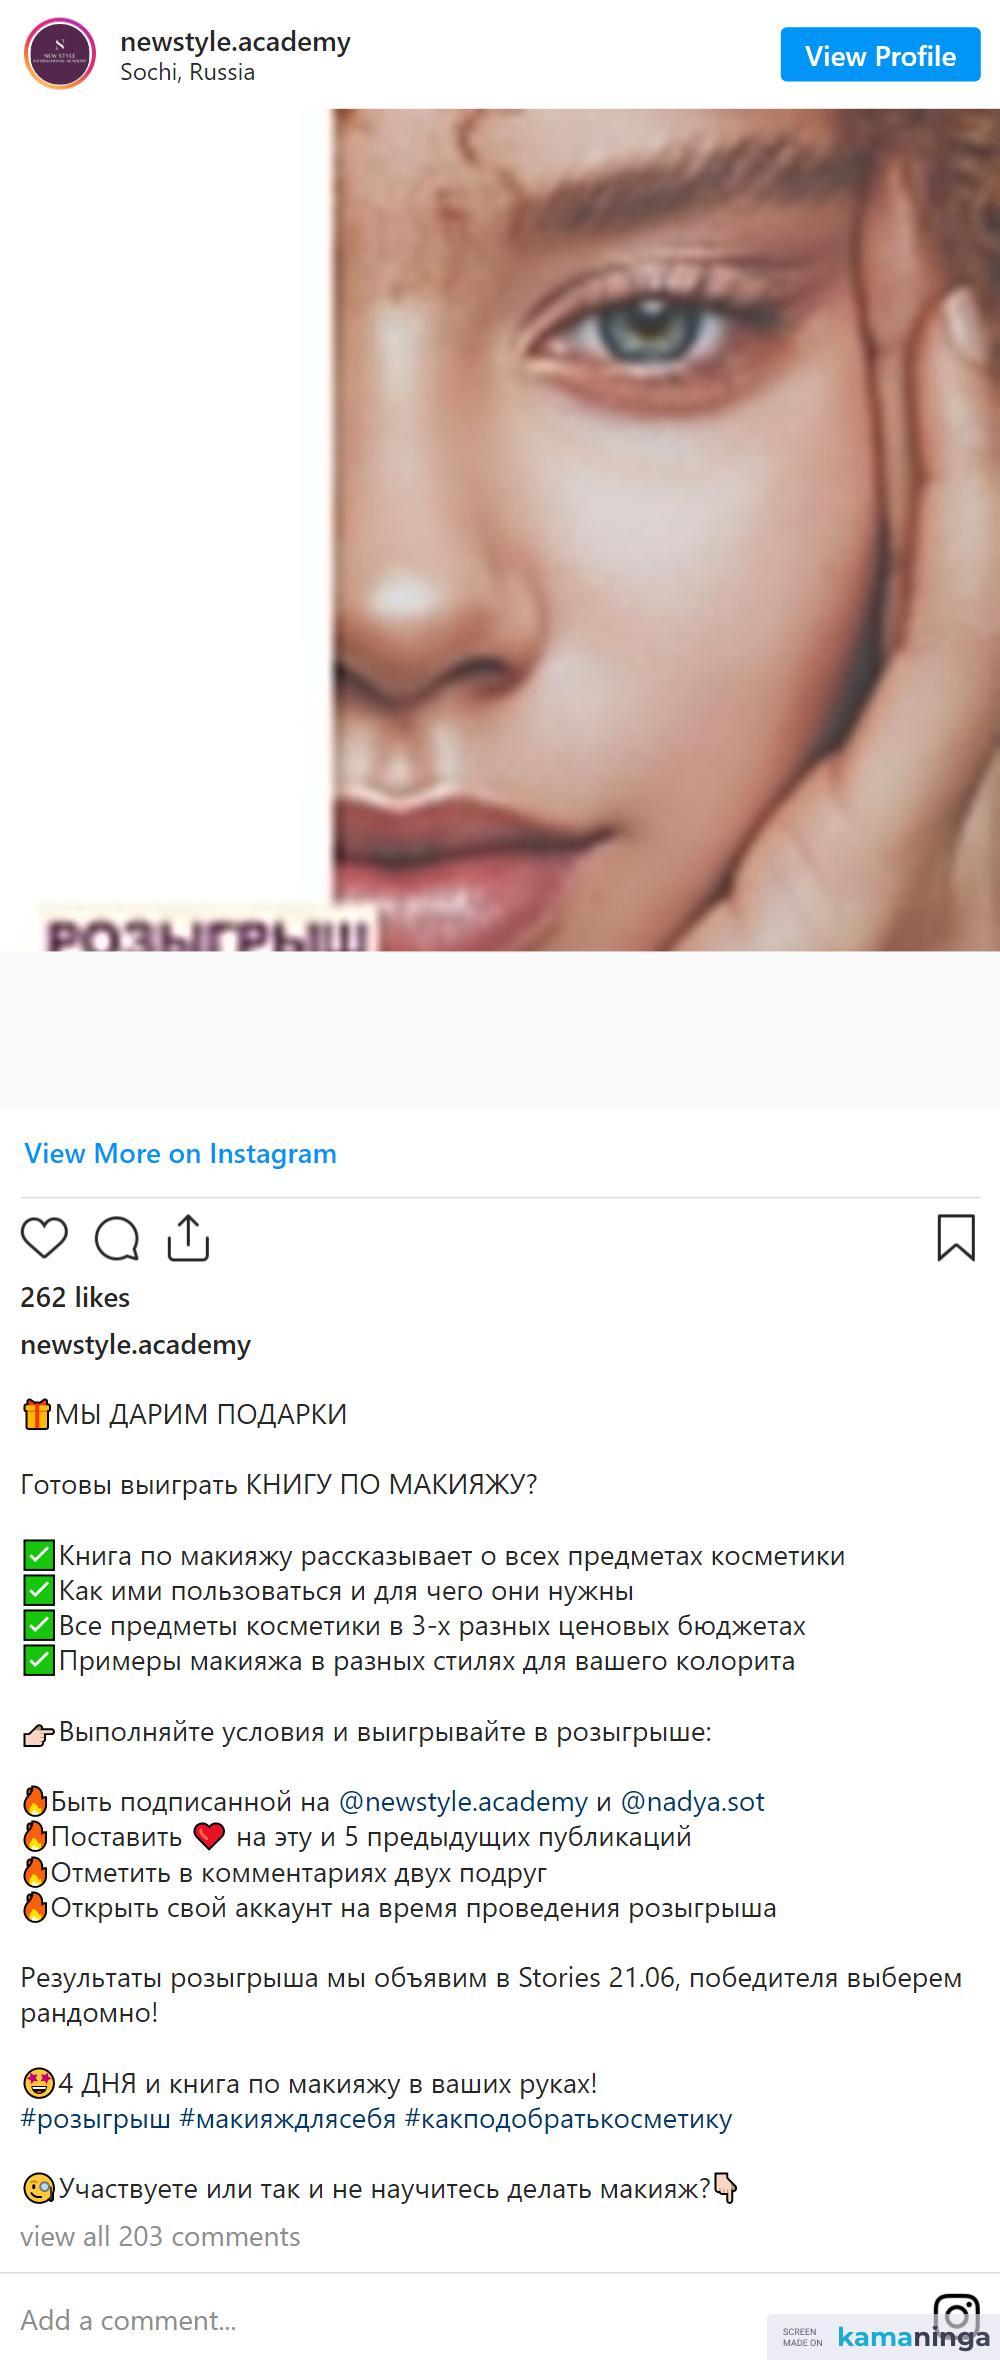 https://www.instagram.com/p/CQLdcvgHgFc/